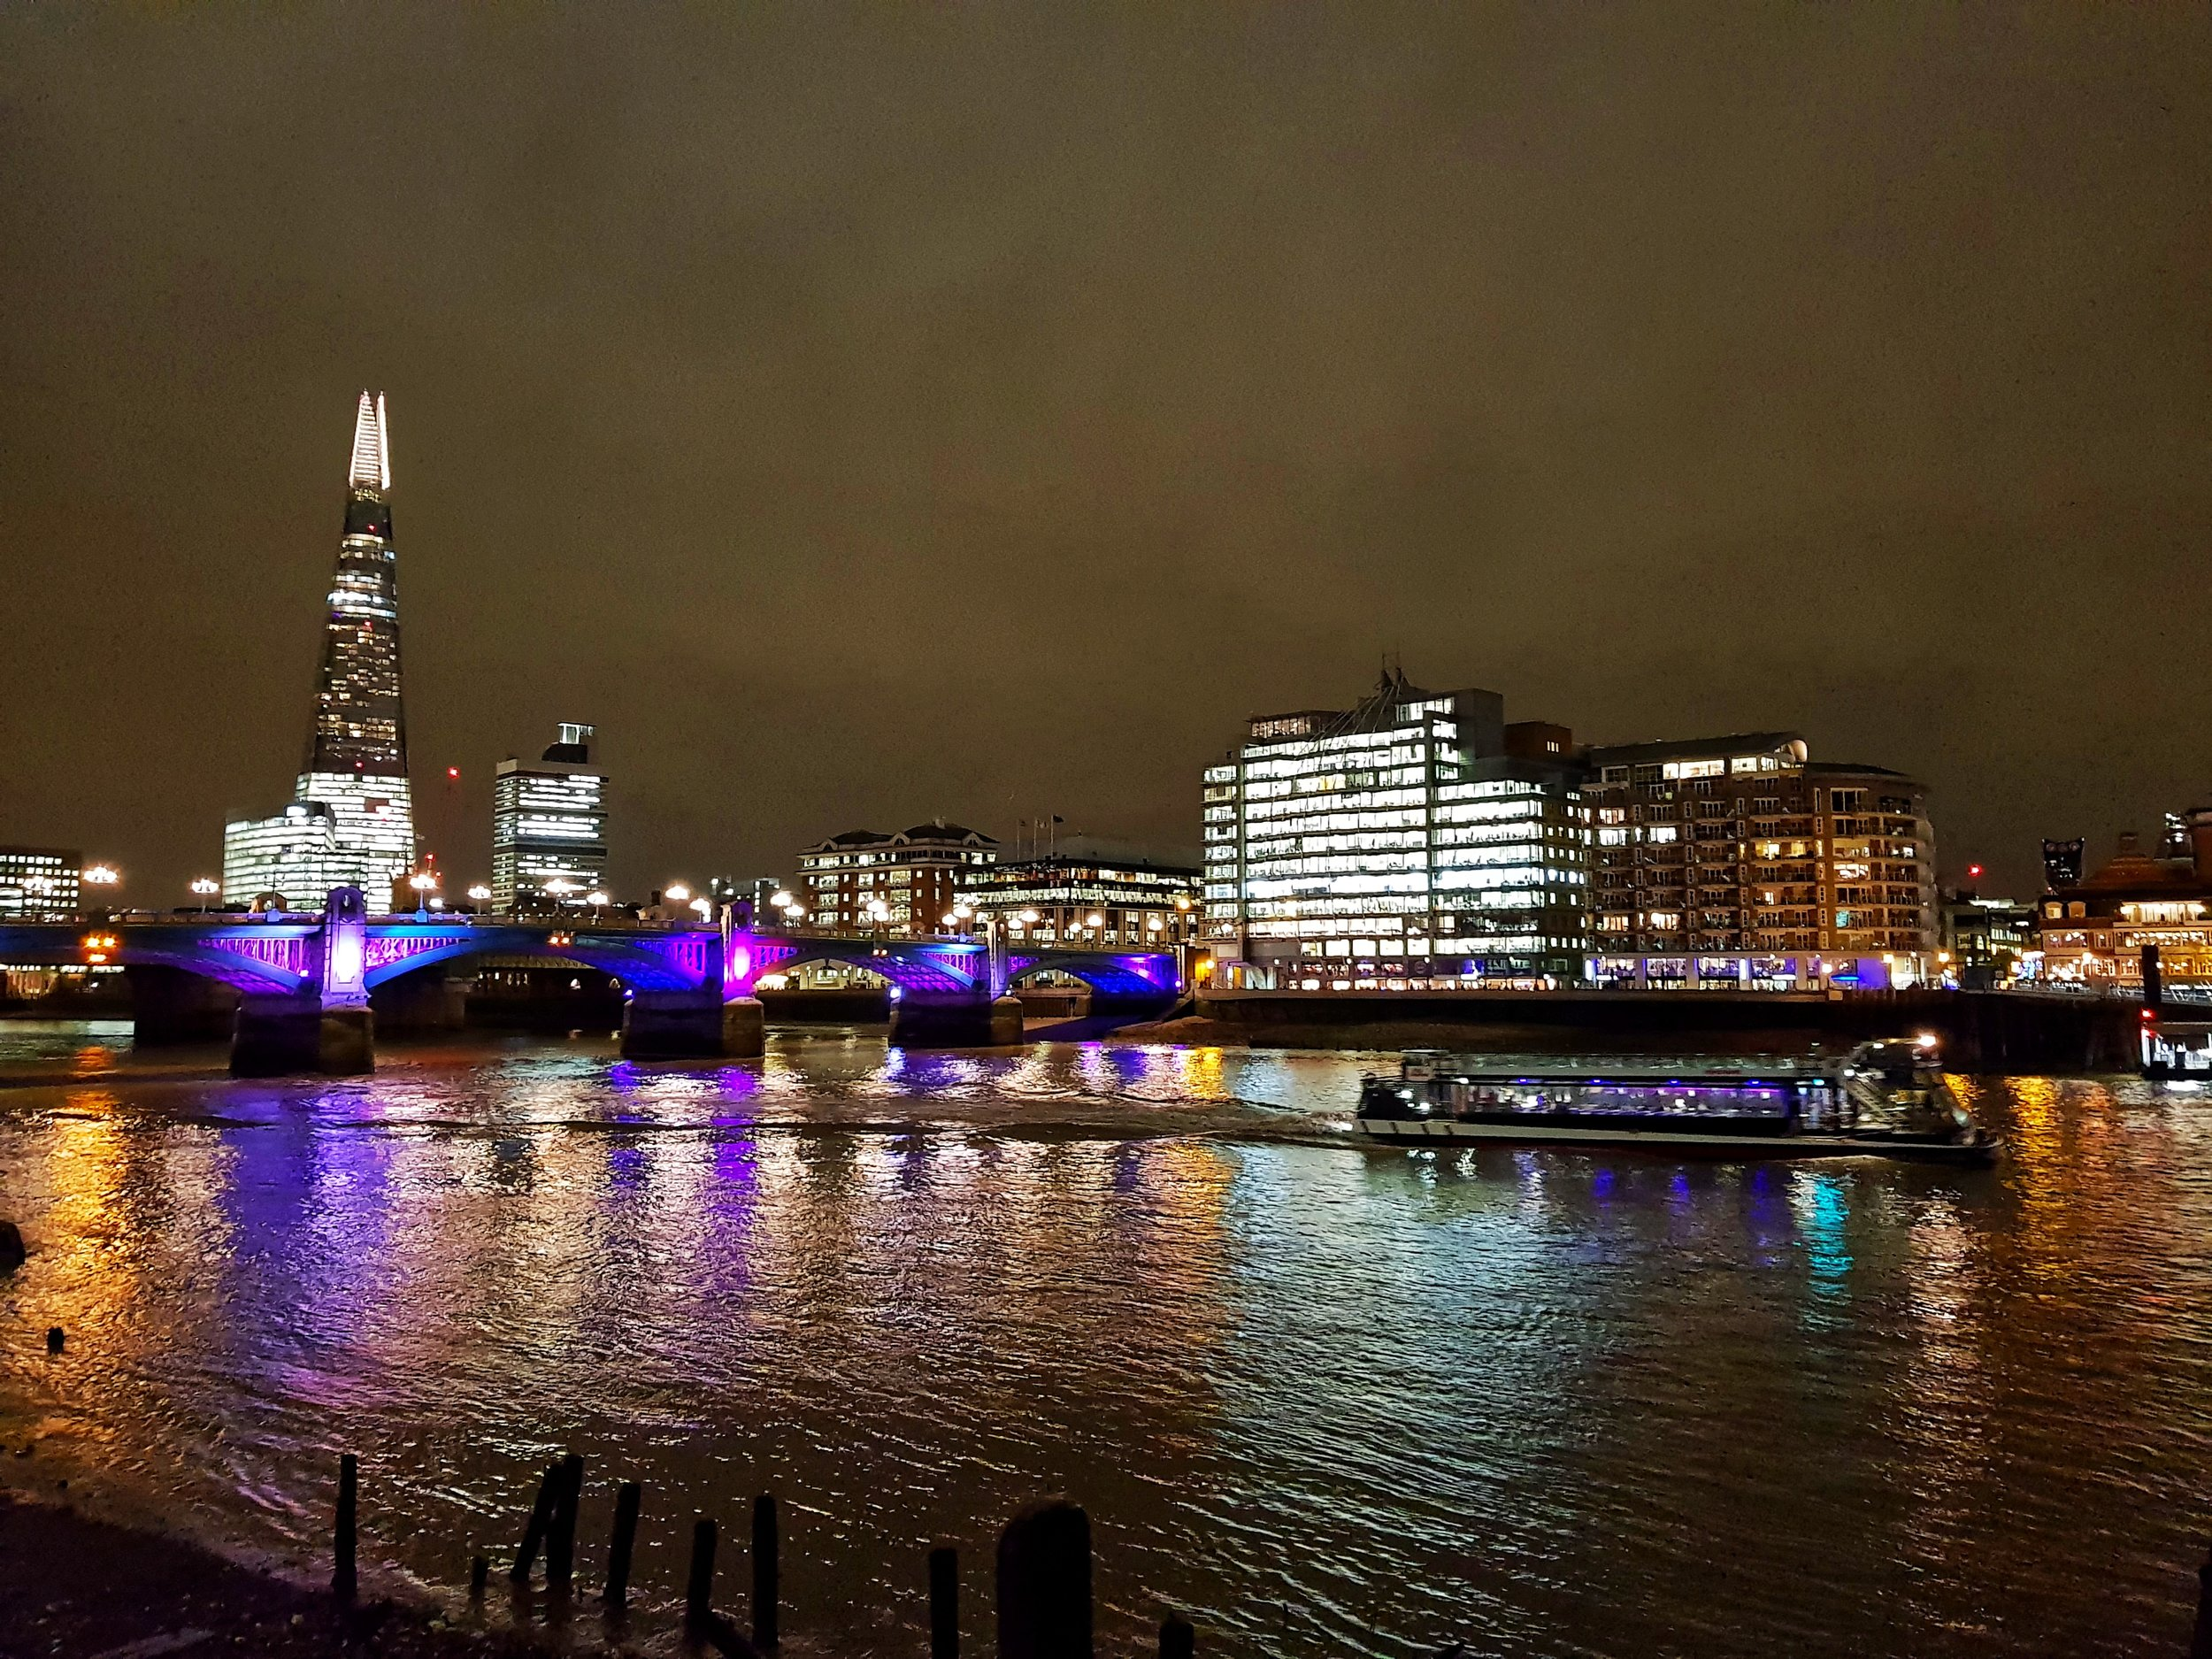 NORTHBANK RESTAURANT LONDON REVIEW